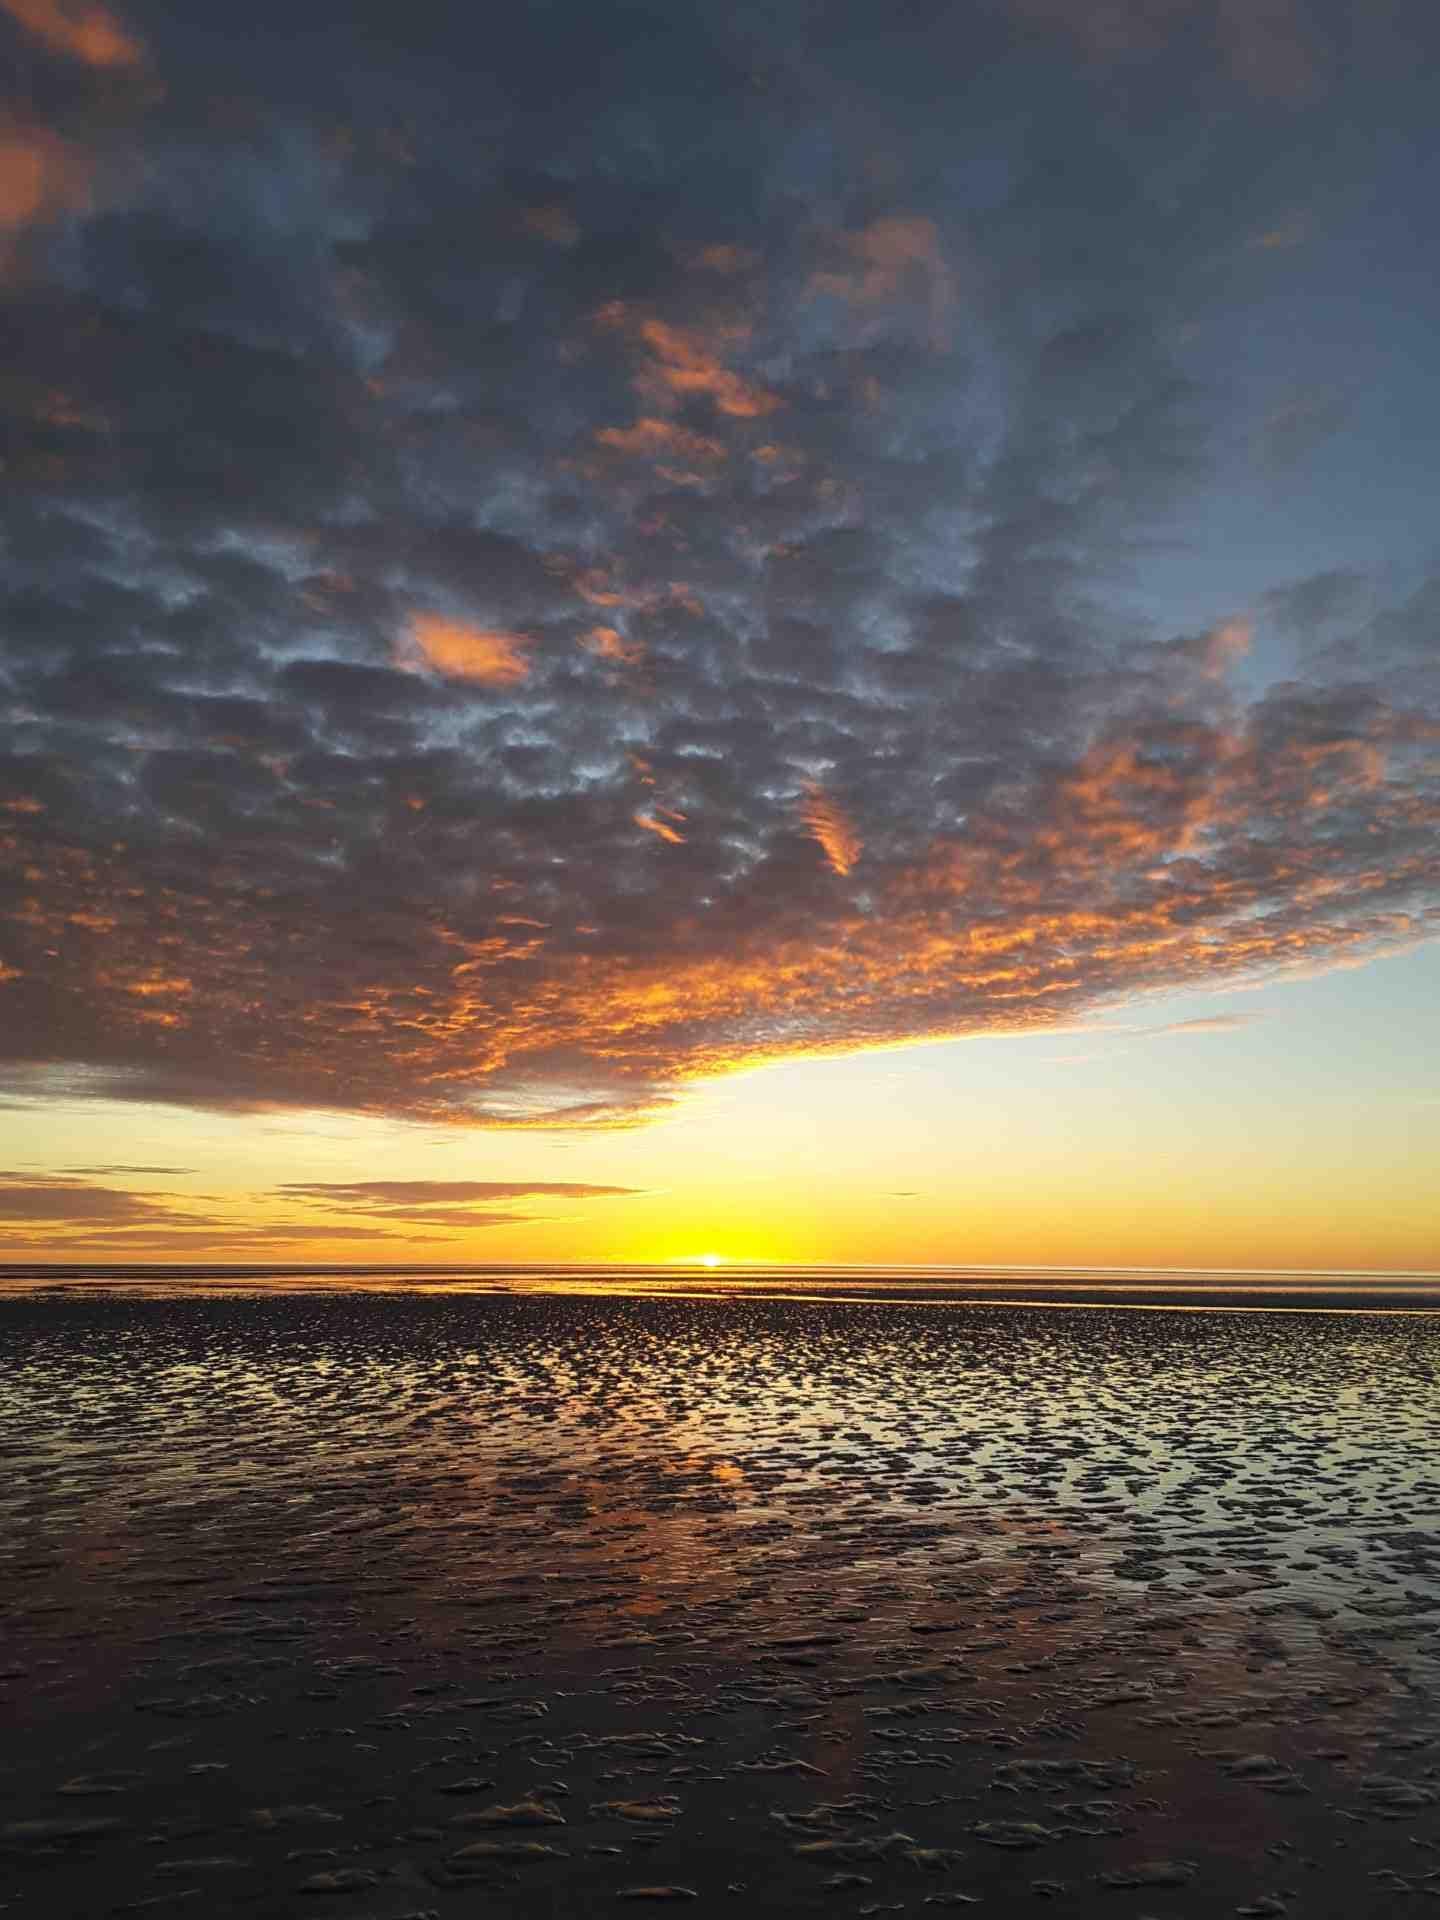 80 Mile Beach - Cloudy Afternoon- image credit Stella Macklin